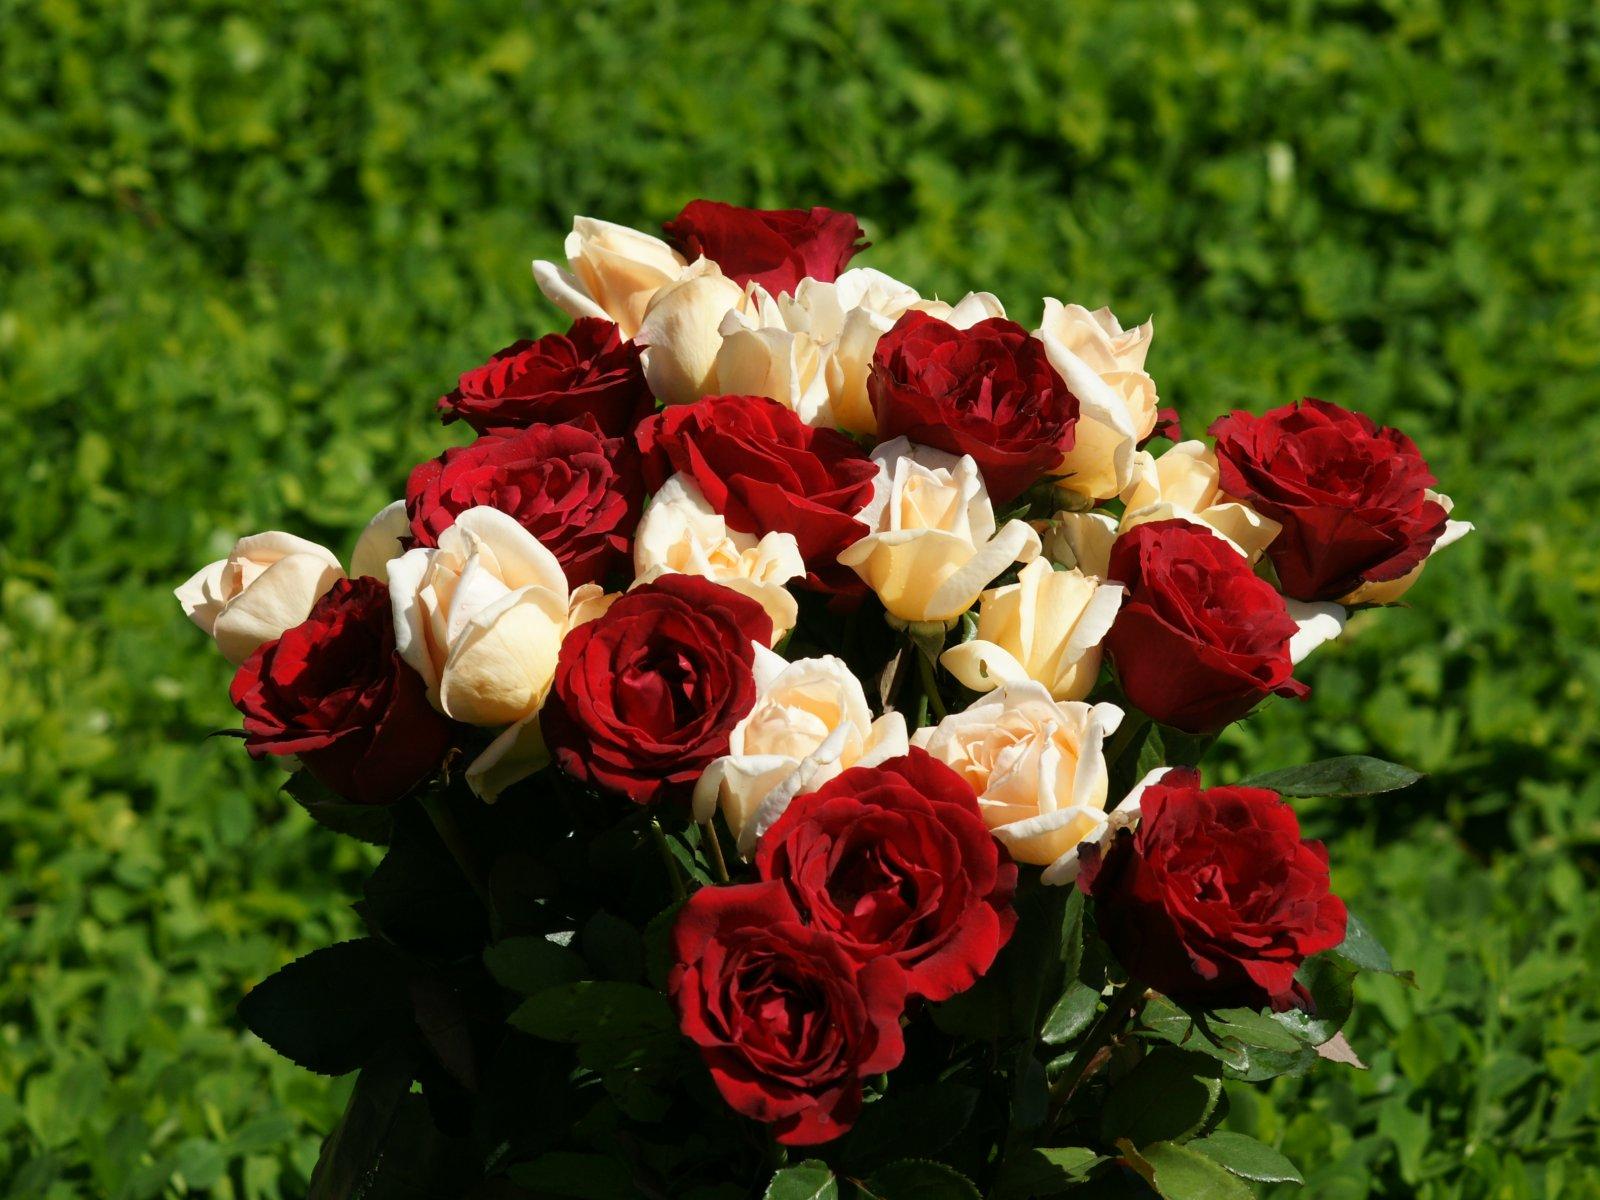 Top Red Rose HD Wallpaper Image